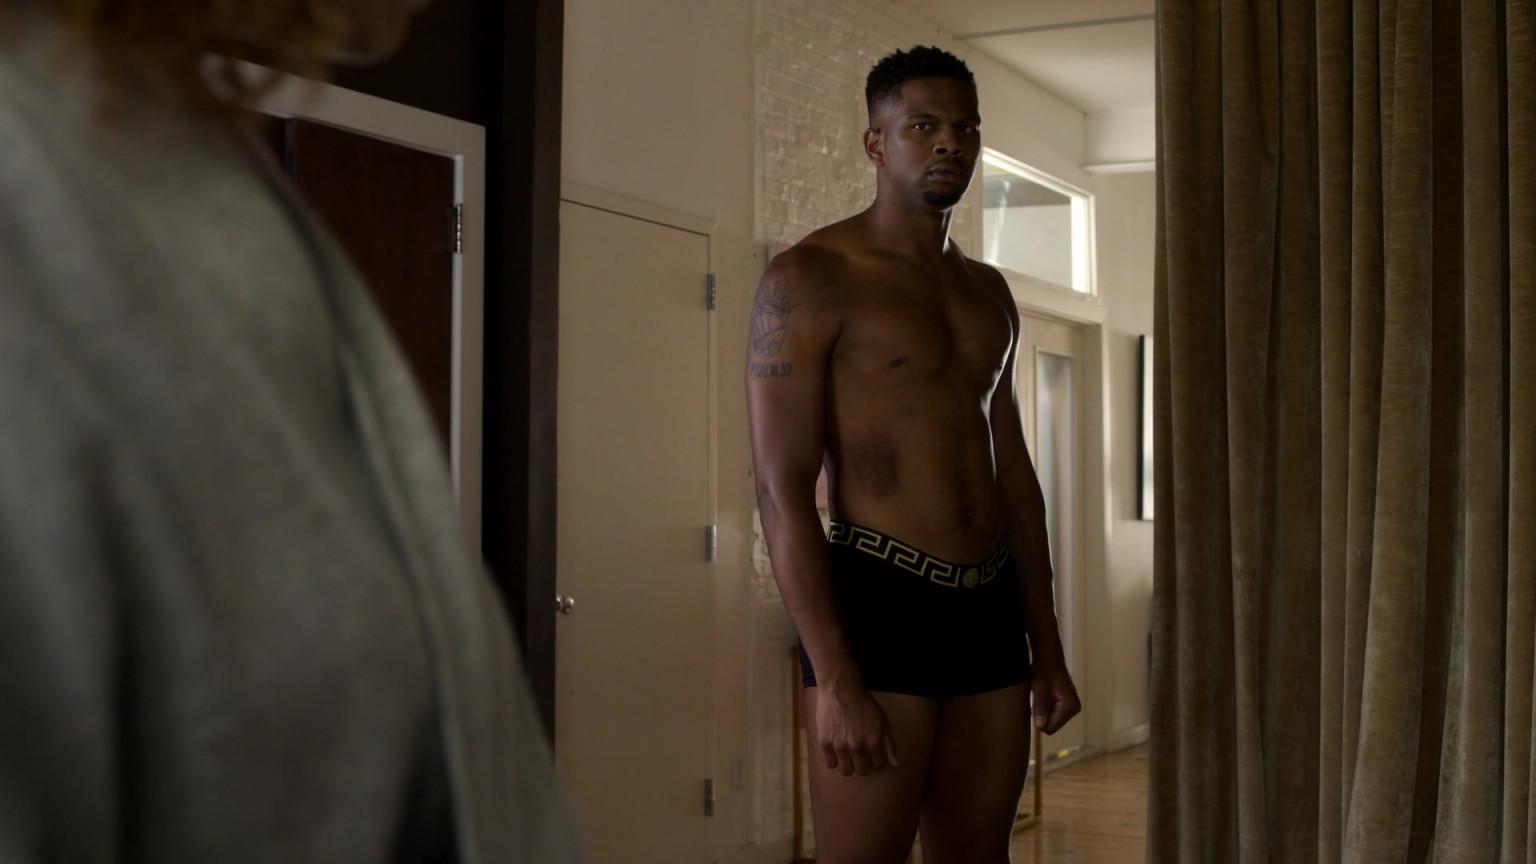 Versace Men's Underwear Of Daniel Bellomy As Ezekiel Cross ...